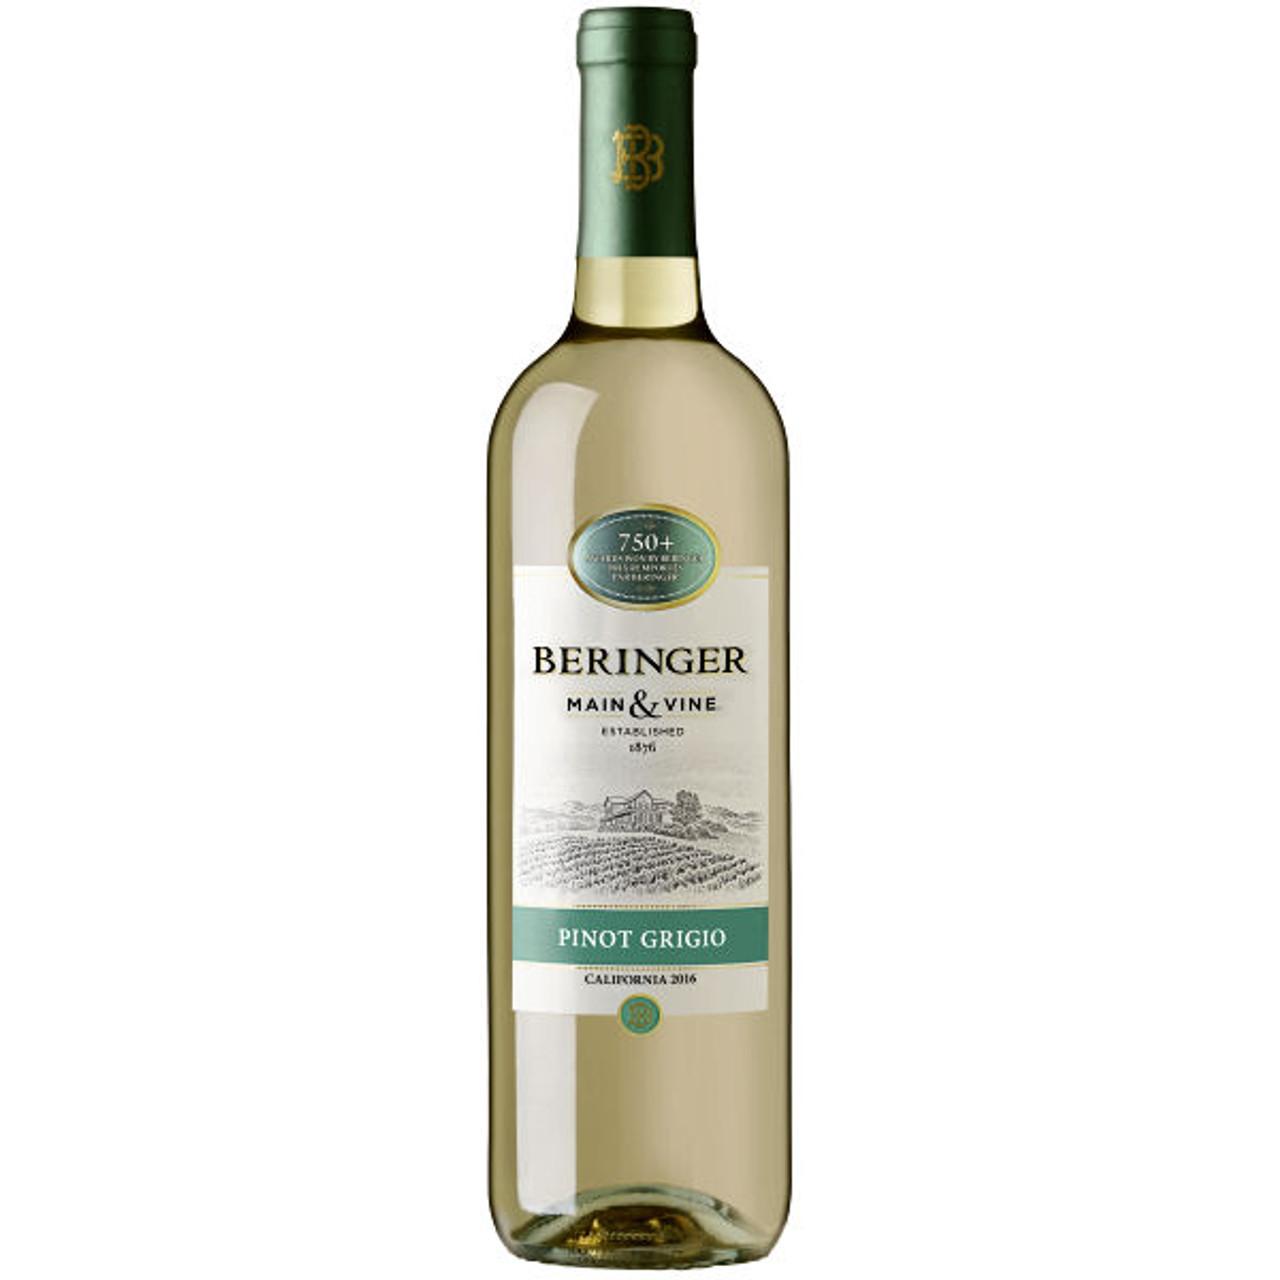 Beringer Main & Vine American Pinot Grigio